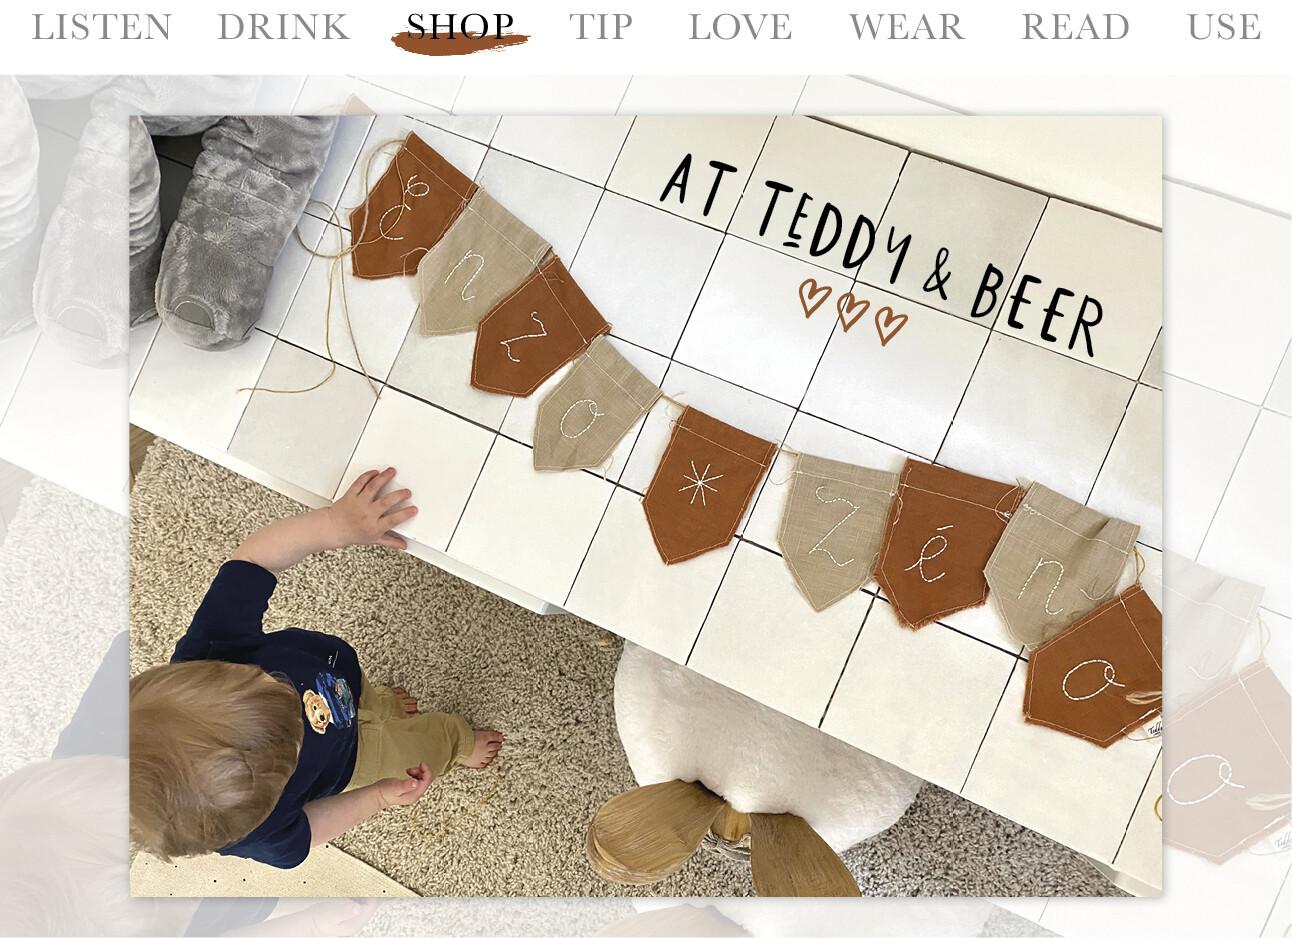 Today we shop at teddy en beer